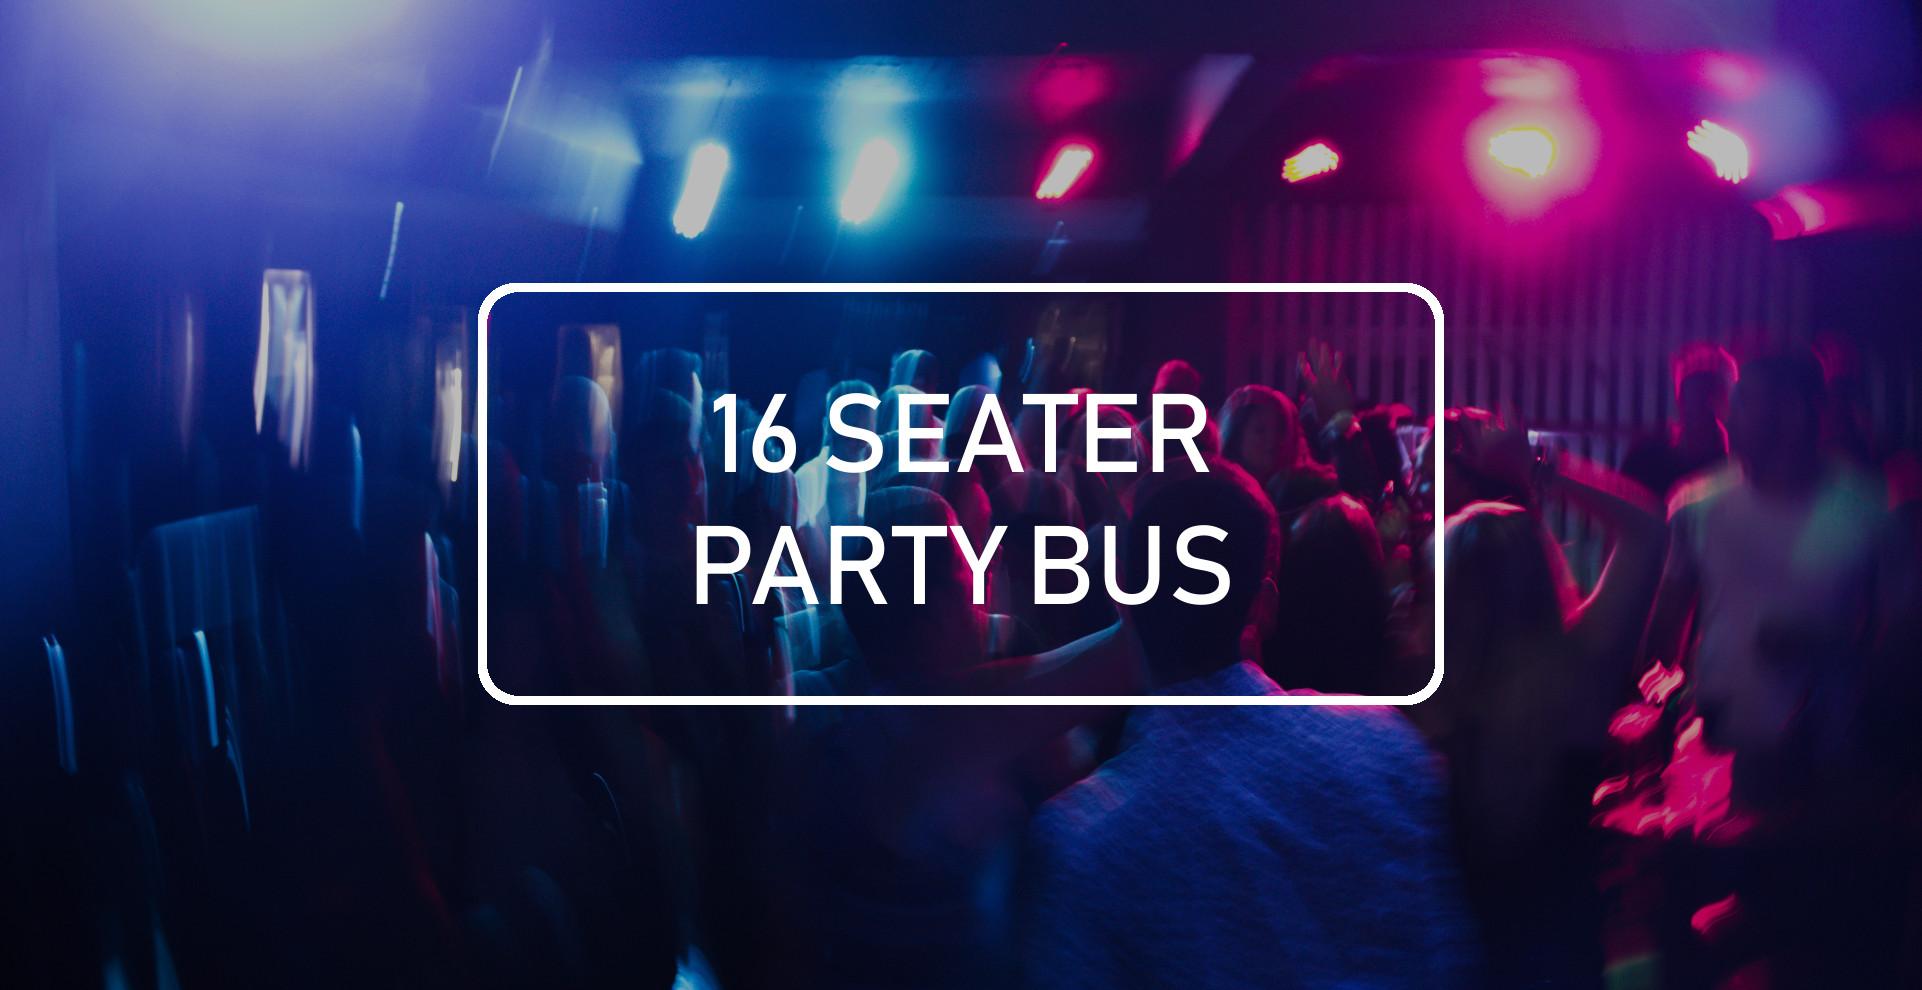 PartyBus NorthEast